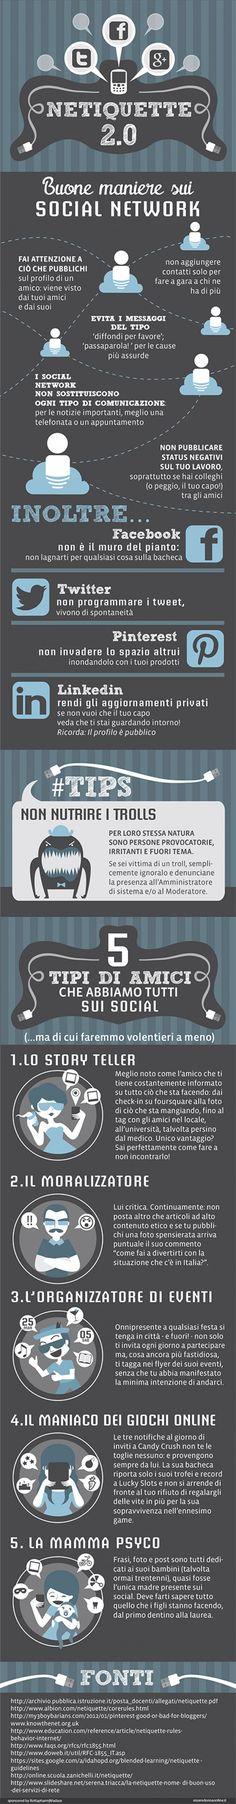 Netiquette 2.0: buone maniere sui social network